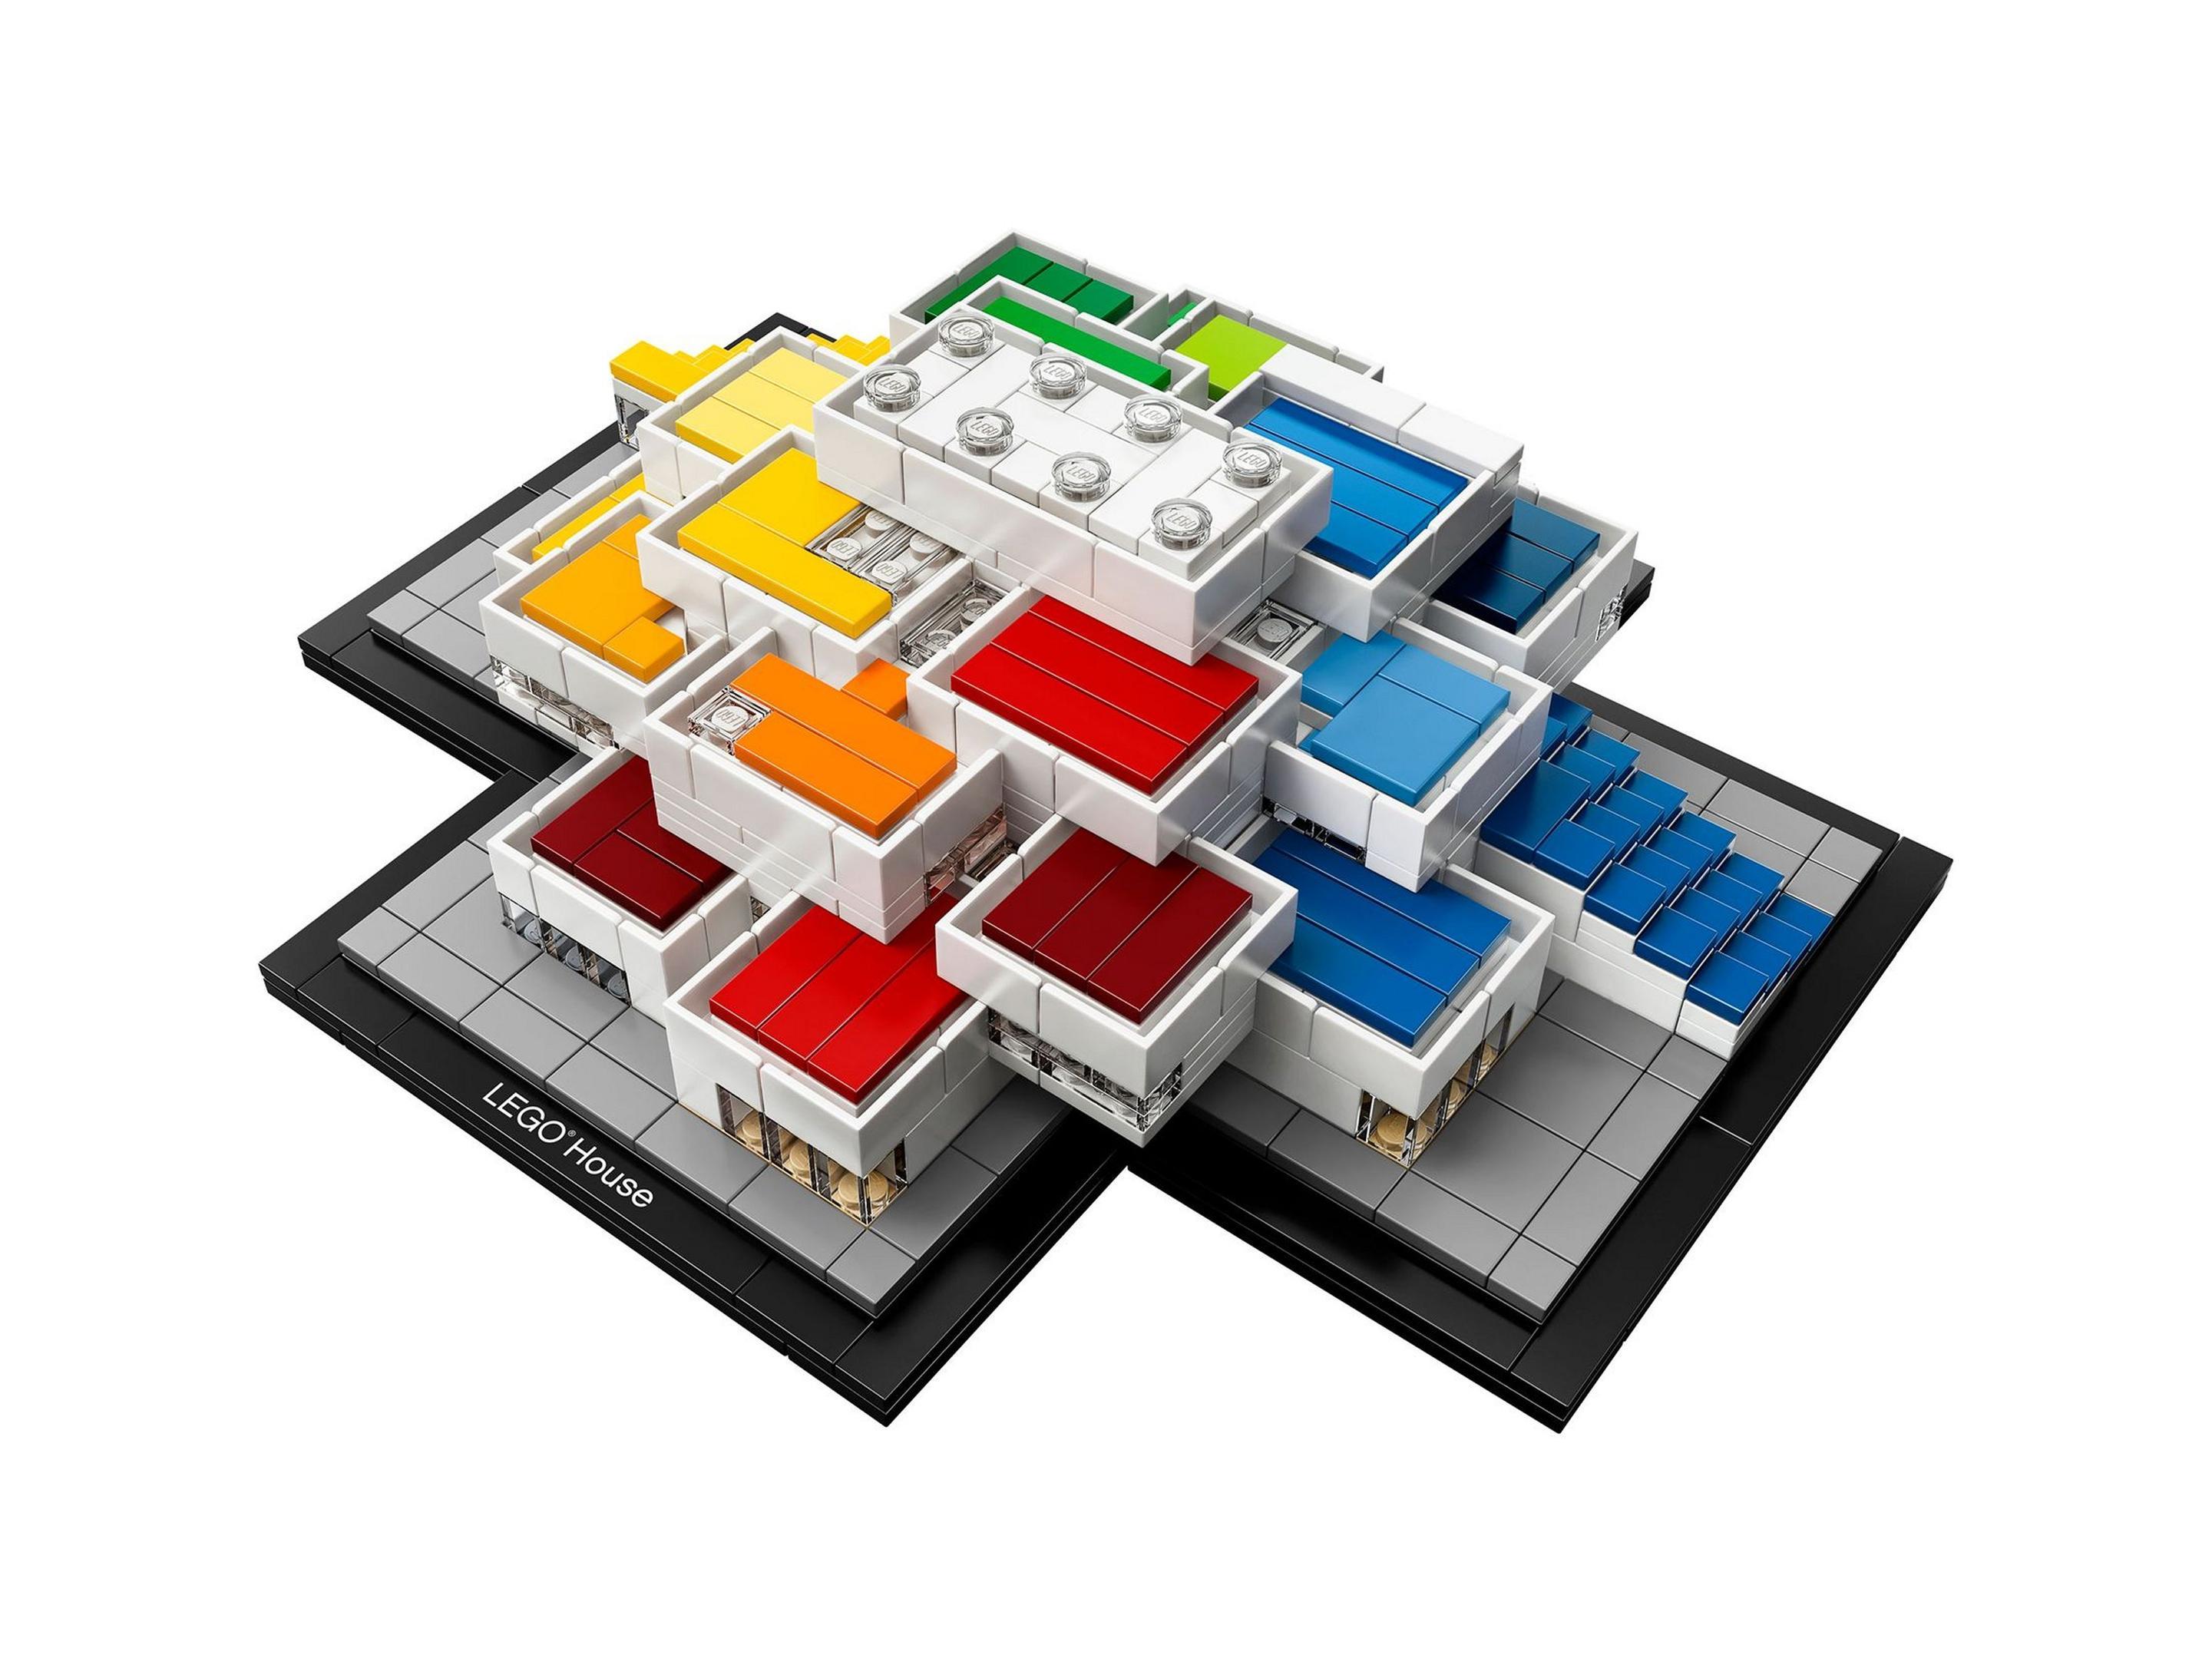 LEGO 21037-1 LEGO House - Ninja Brick